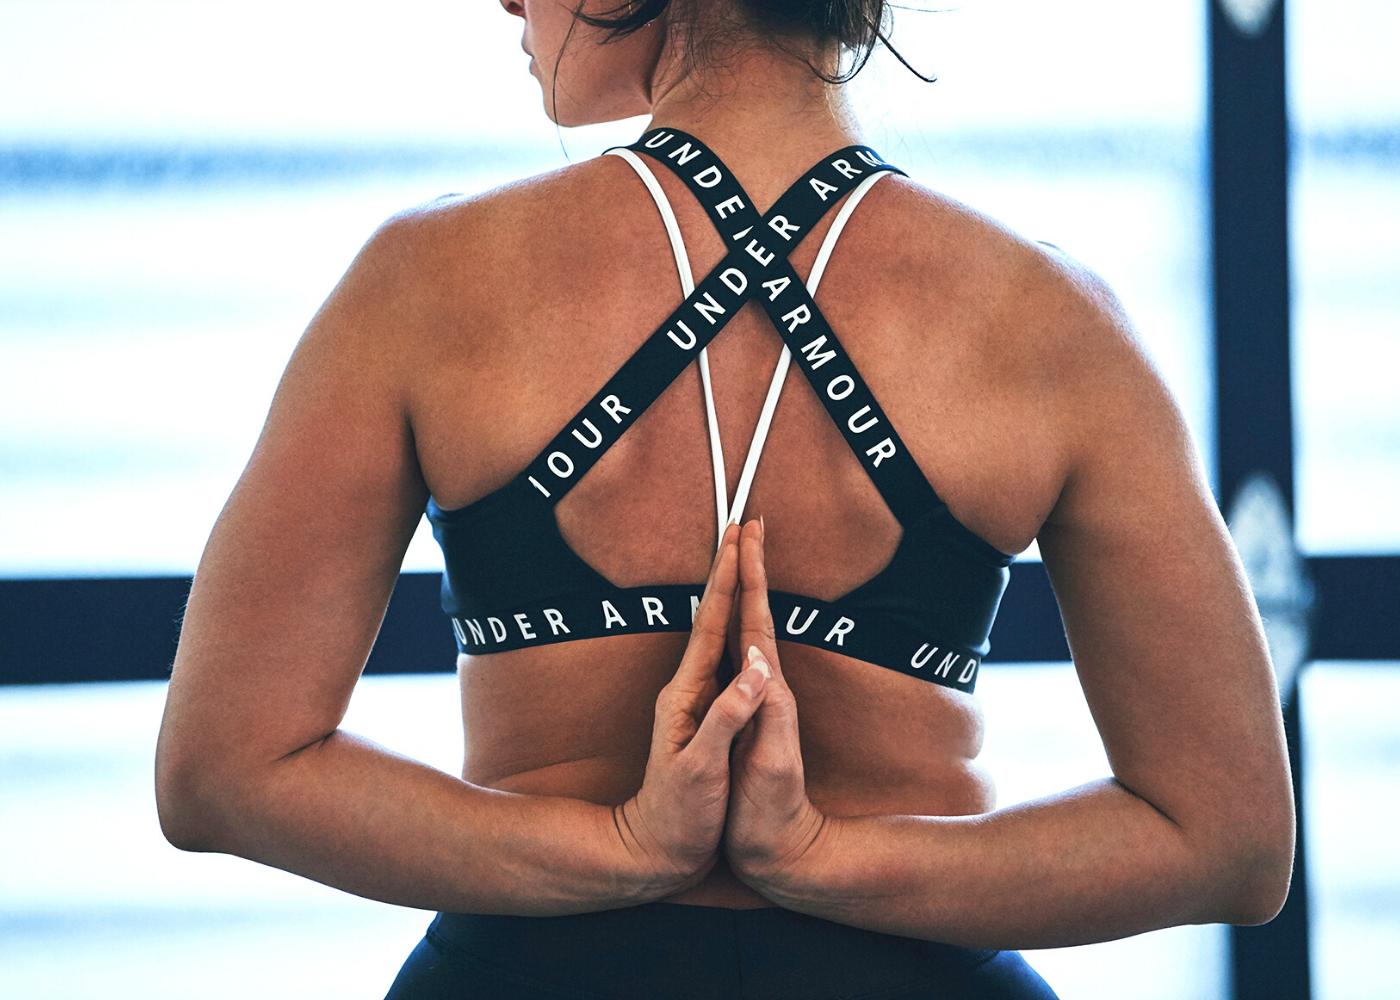 Women's UA Wordmark Strappy Sports Bralette Bra. Photography: Under Armour